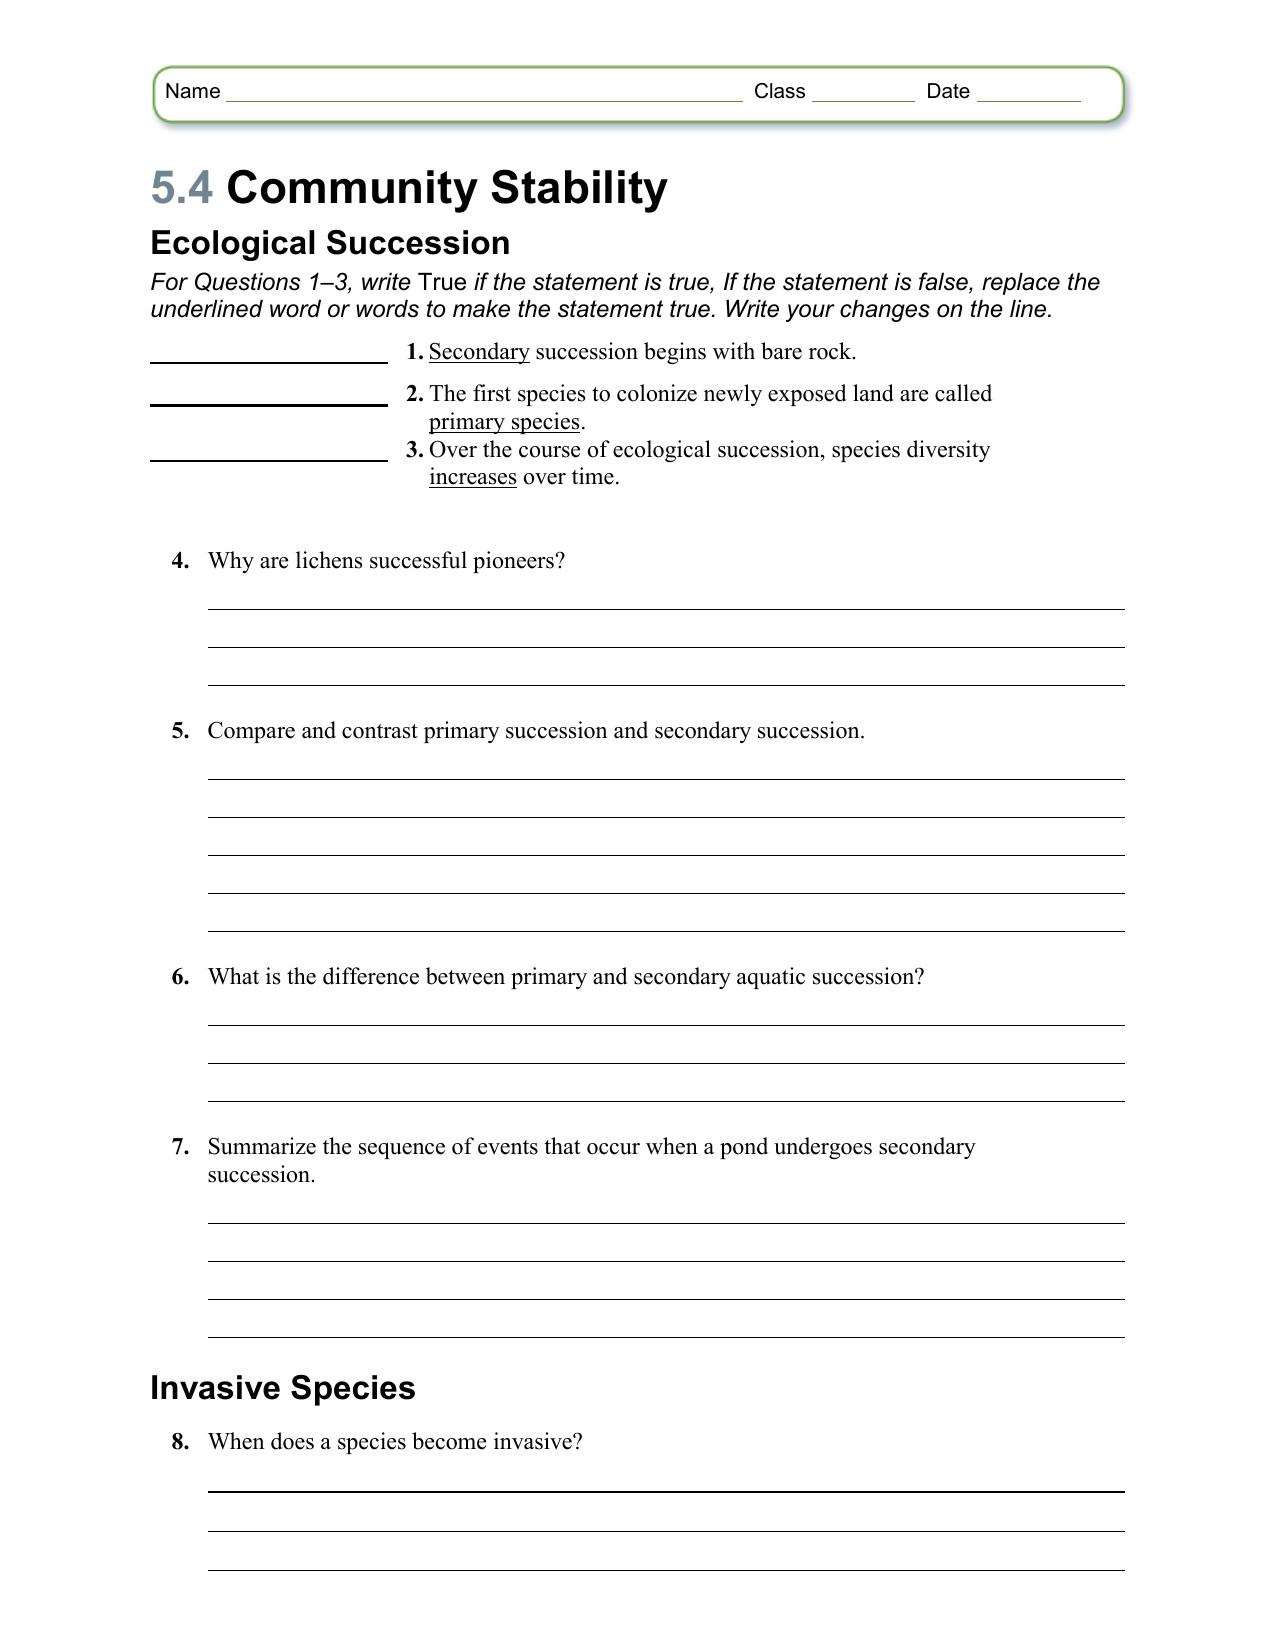 Ecology Review Worksheet 1 Ecological Succession Notes Worksheet